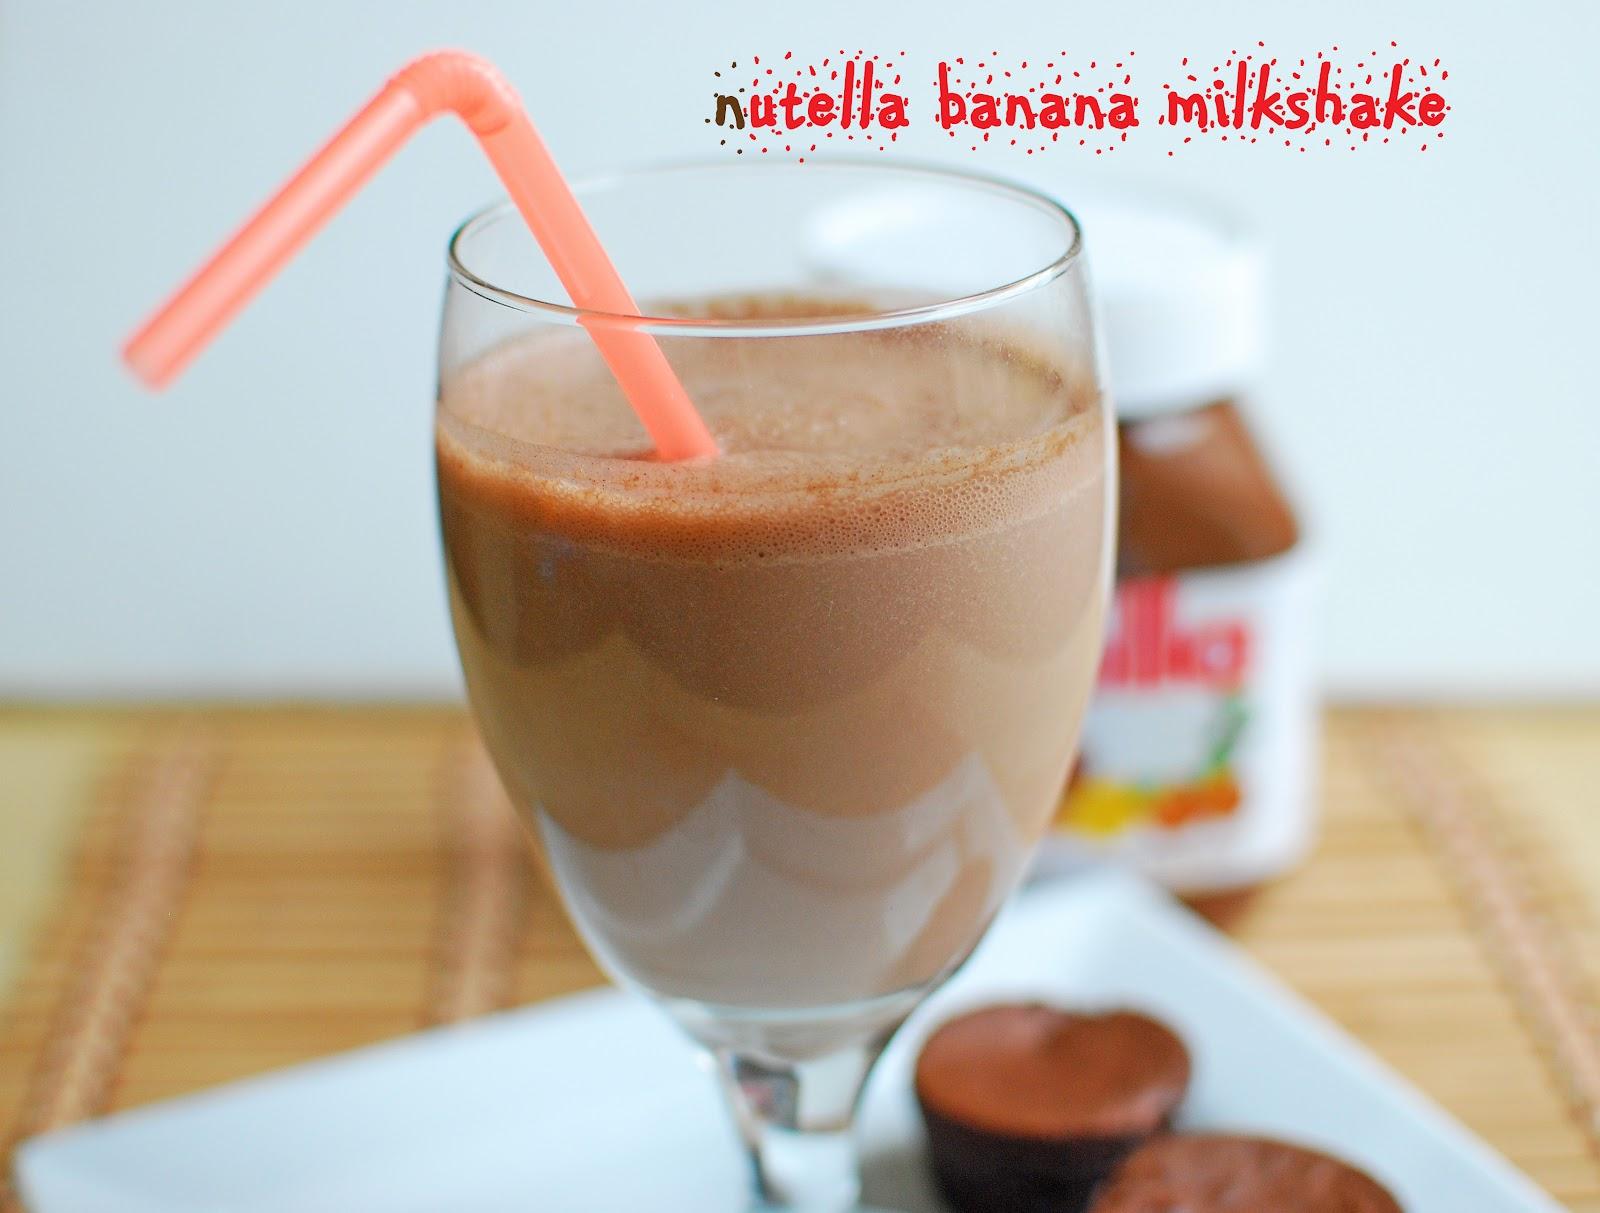 Nutella Banana Milkshake | Kid Friendly Drink ~ From My Home Kitchen